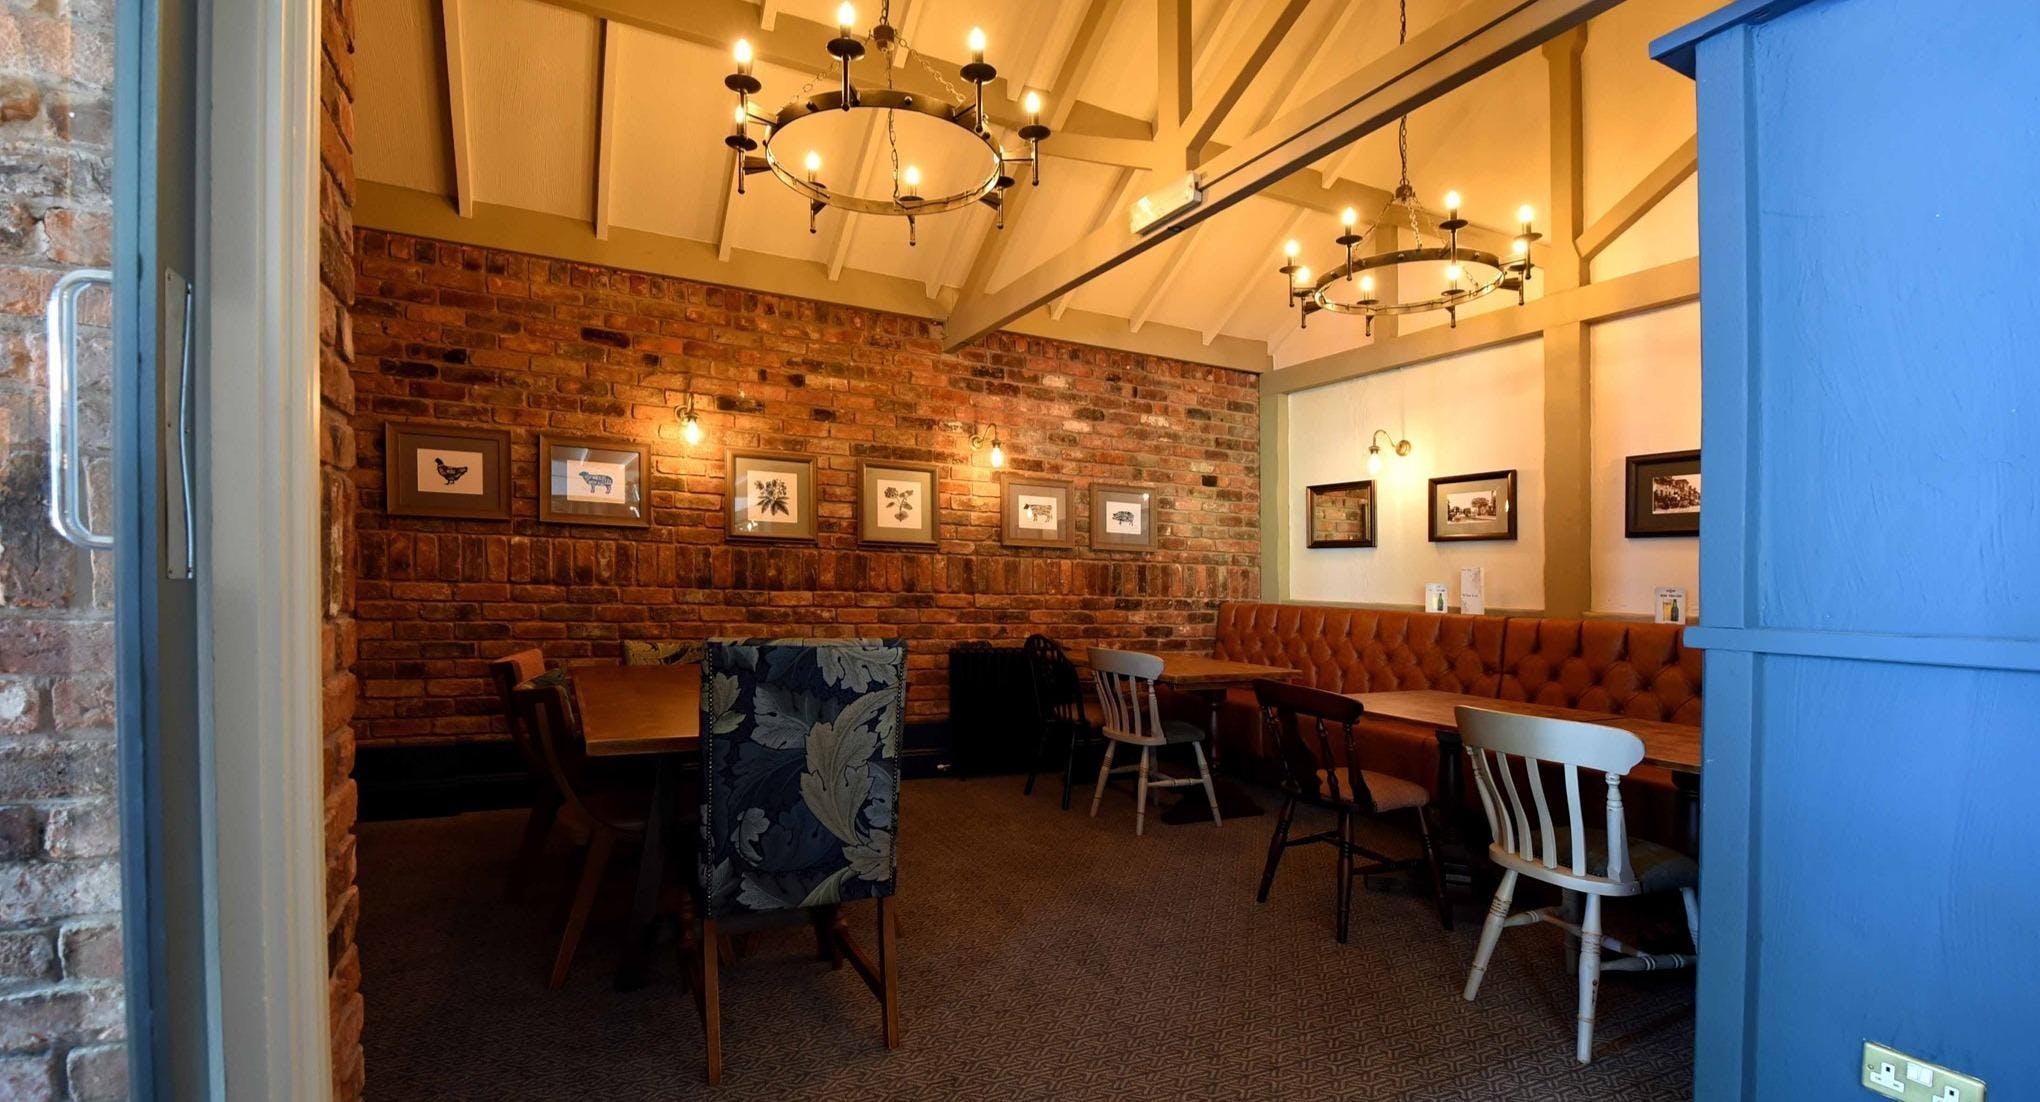 The New Inn - Bournheath Bromsgrove image 2